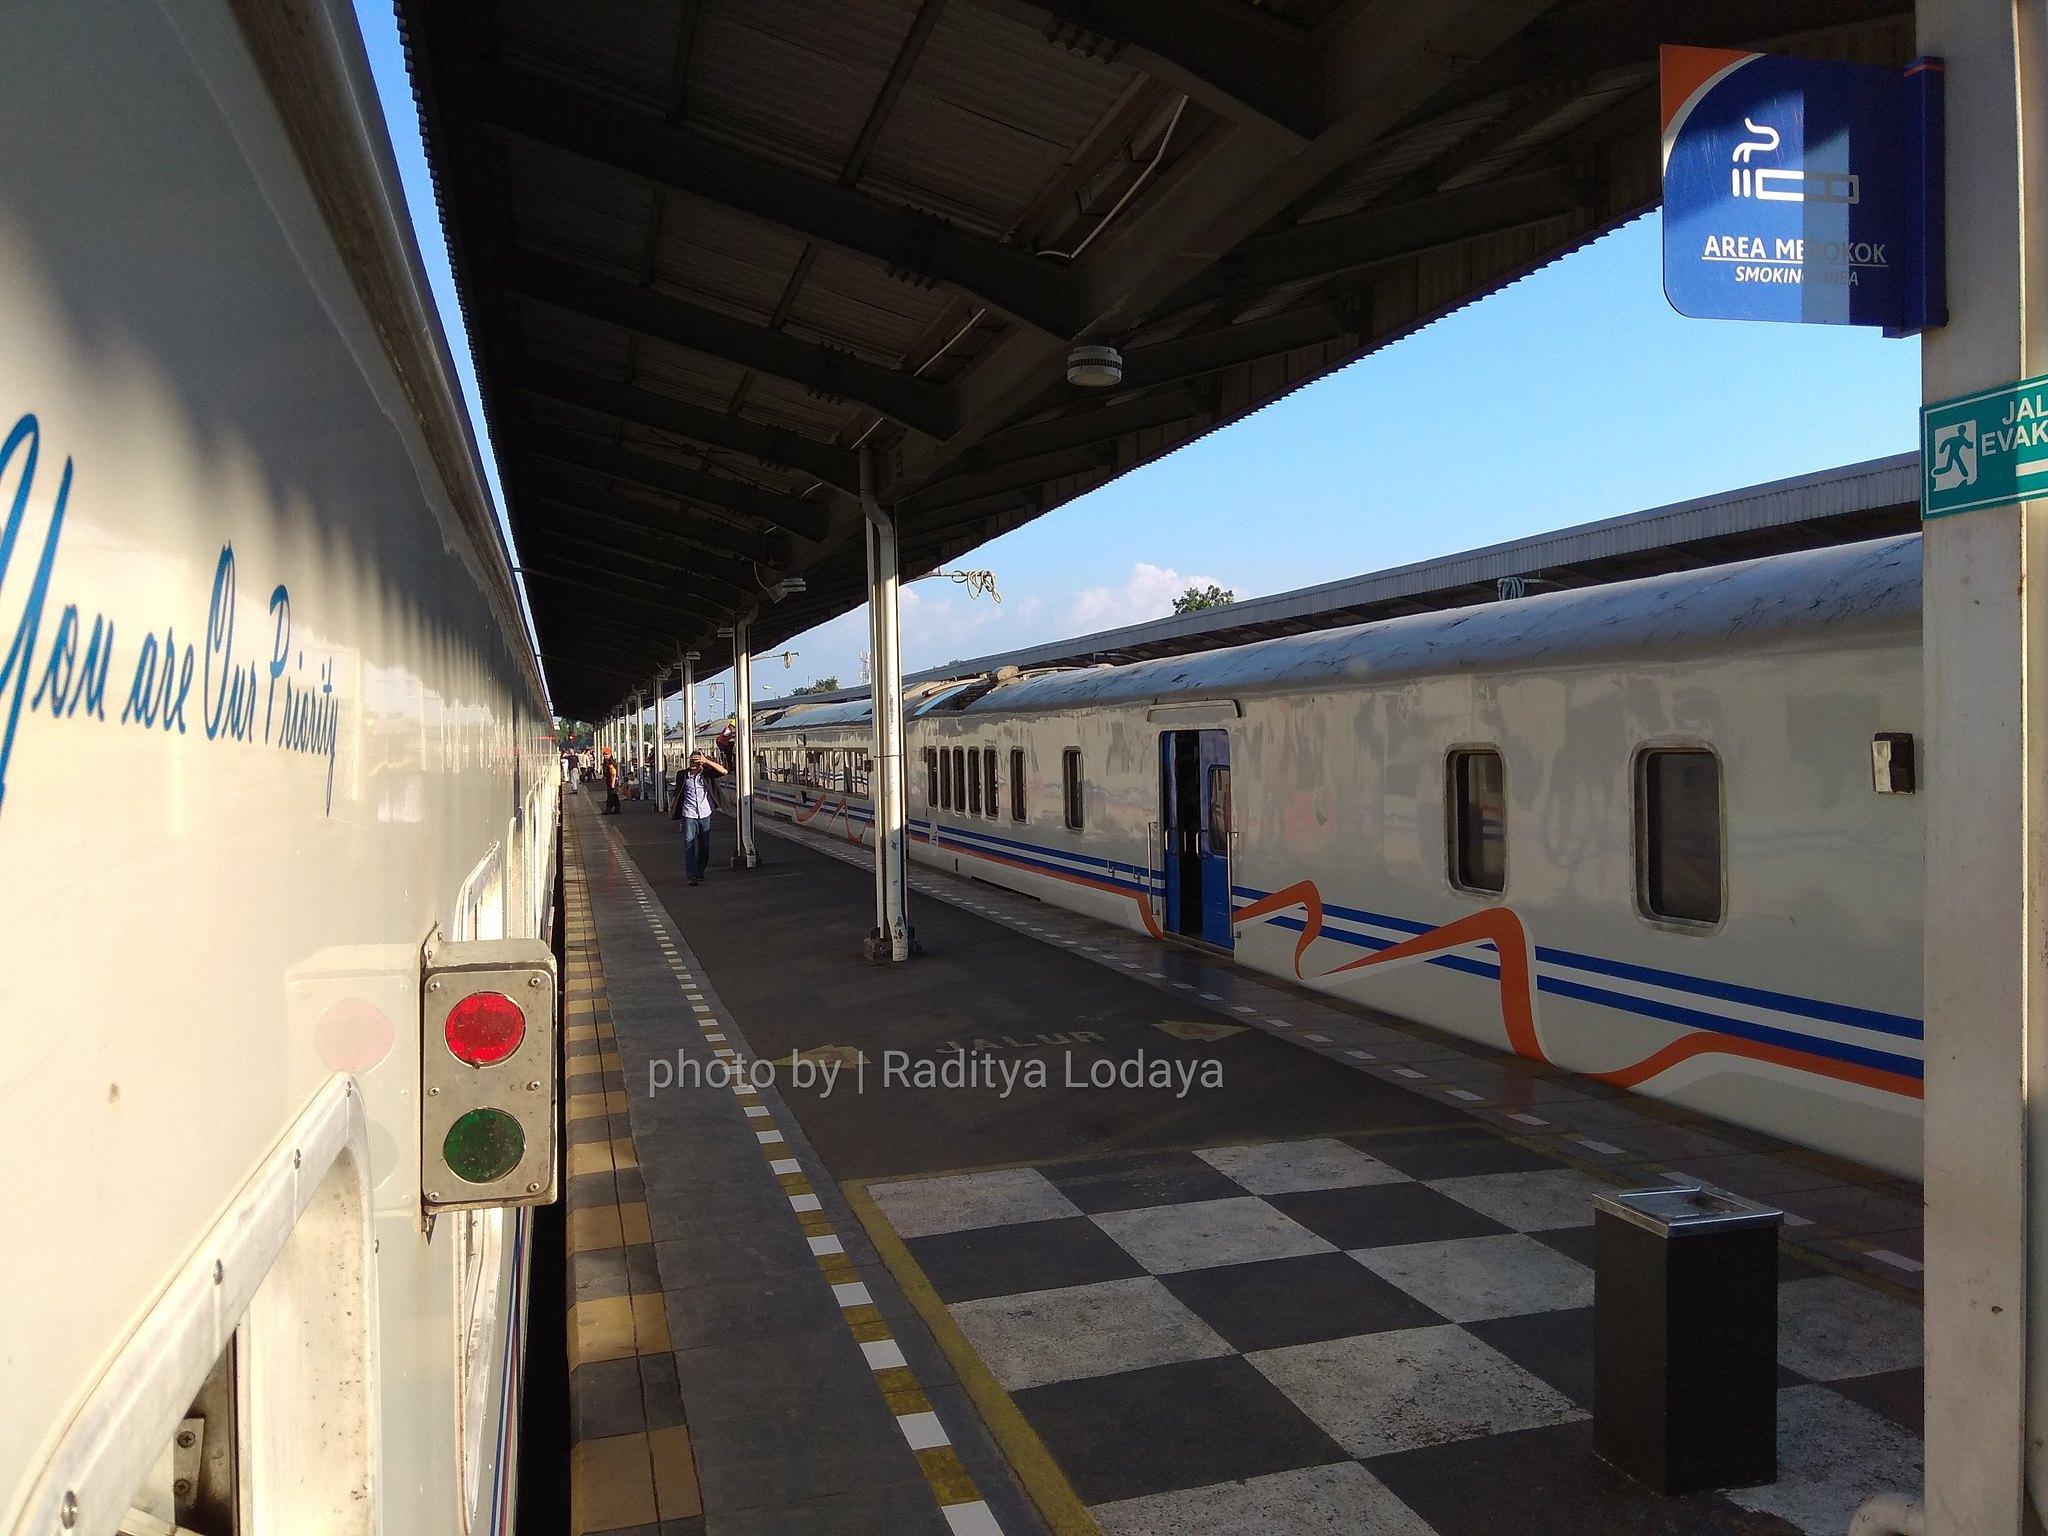 26 TRIP REPORT KERETA API JAYABAYA 1 (JAKARTA-CIREBON) -- STASIUN CIREBON KEJAKSAAN 3